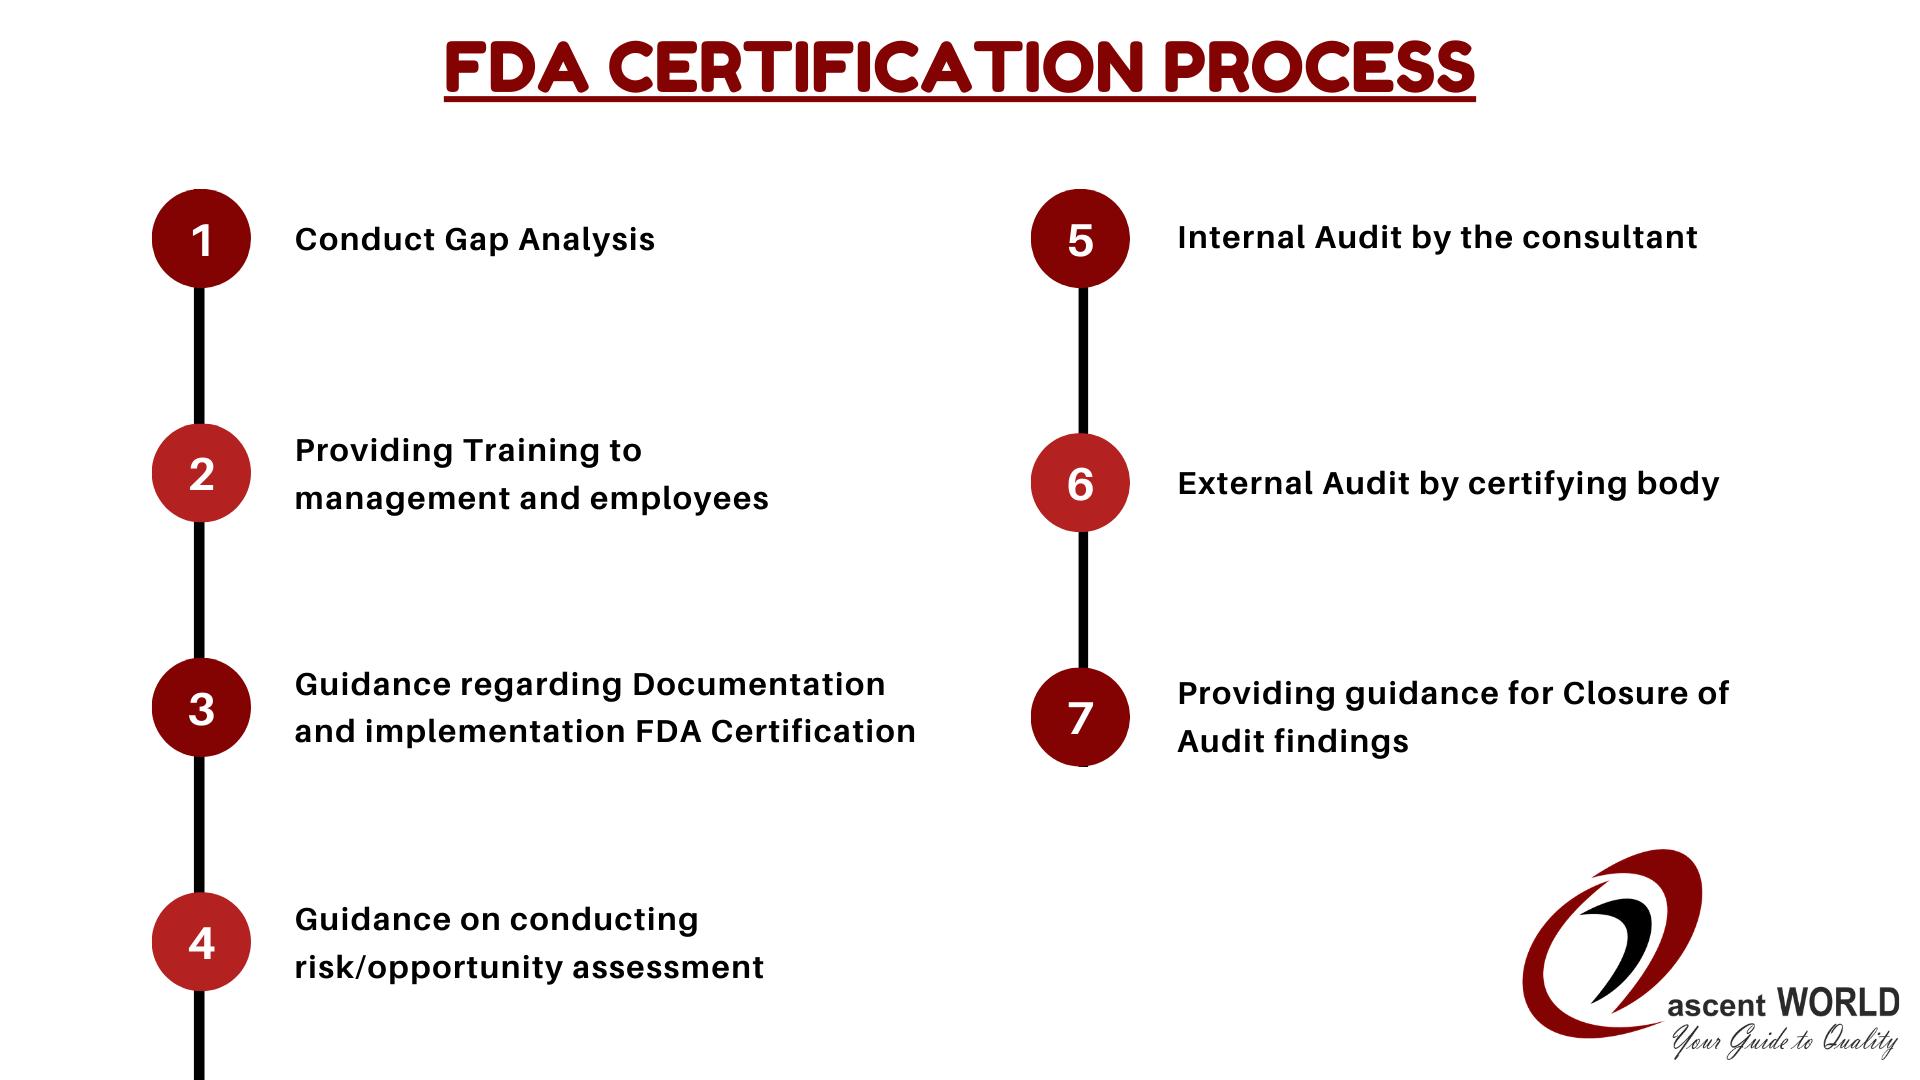 fda Certification process